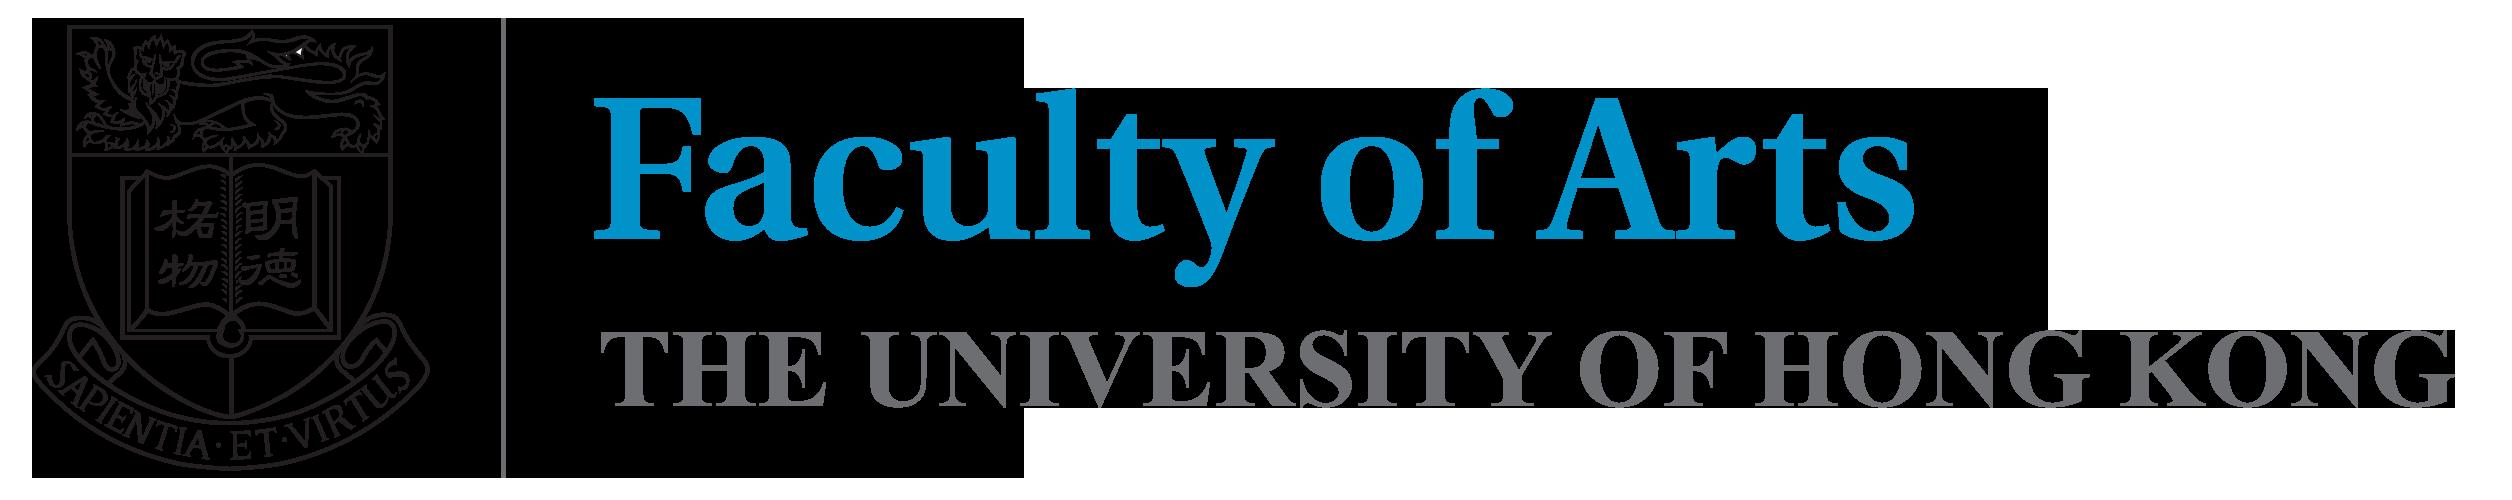 Faculty-of-Arts-logo